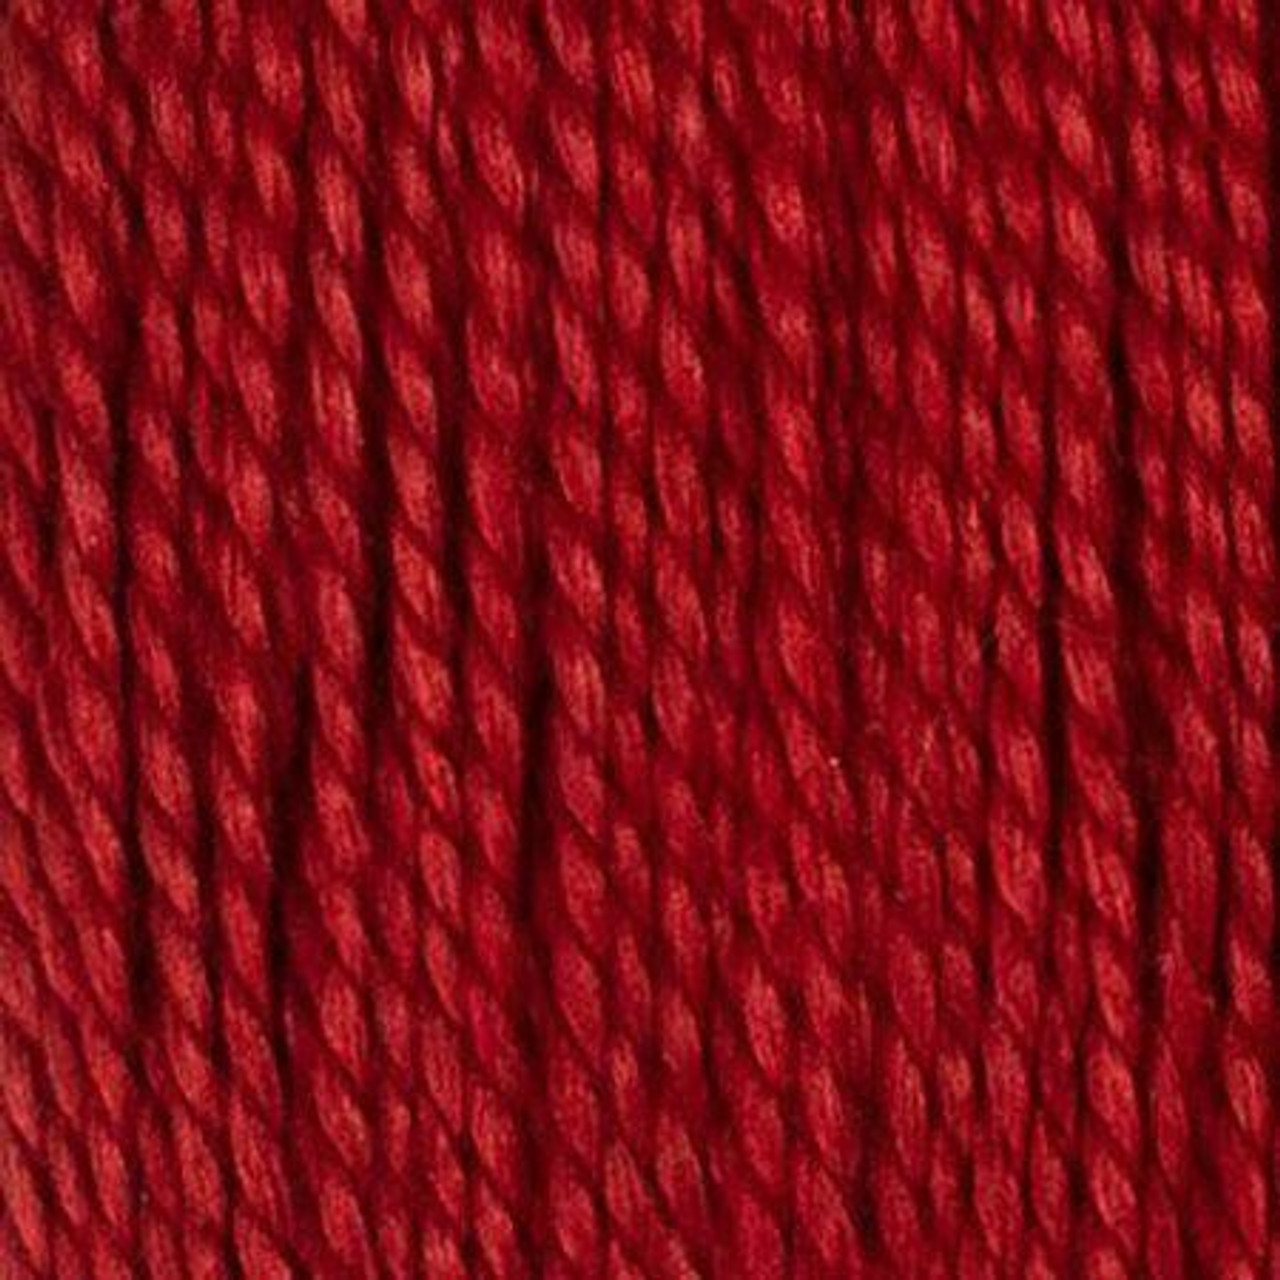 House of Embroidery : 8wt Perle Cotton - SriLanka (51B)